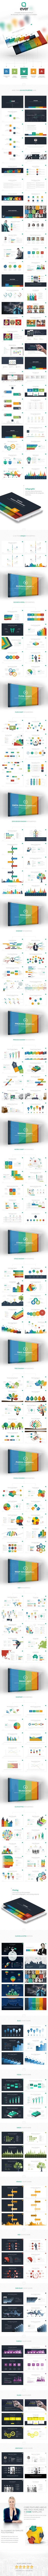 Ever - Multipurpose Presentation Template - Business Powerpoint Templates